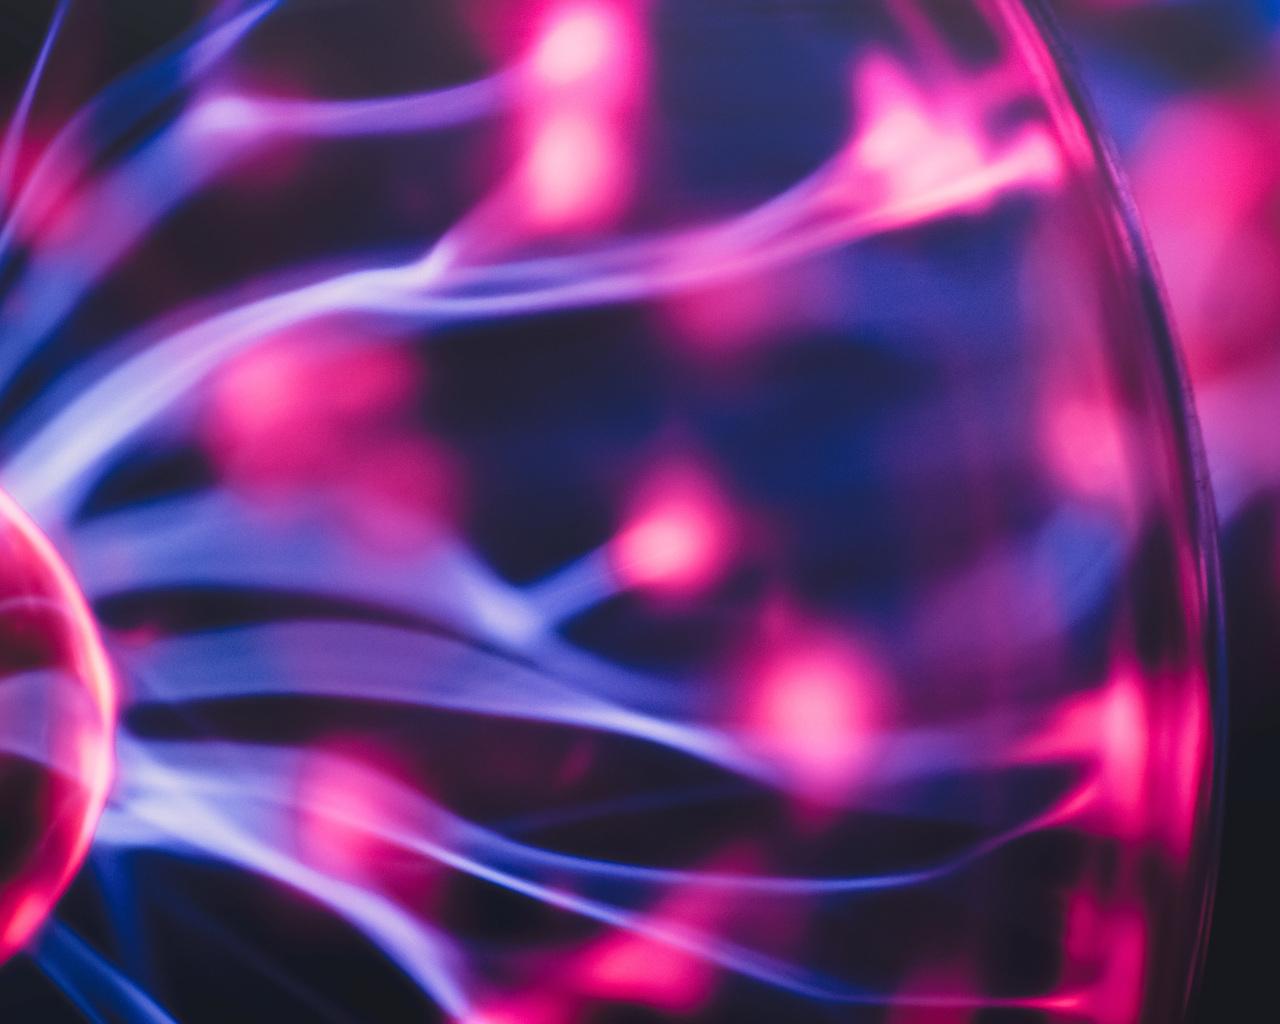 1280x1024 Abstract Energy Glow 4k 1280x1024 Resolution Hd 4k